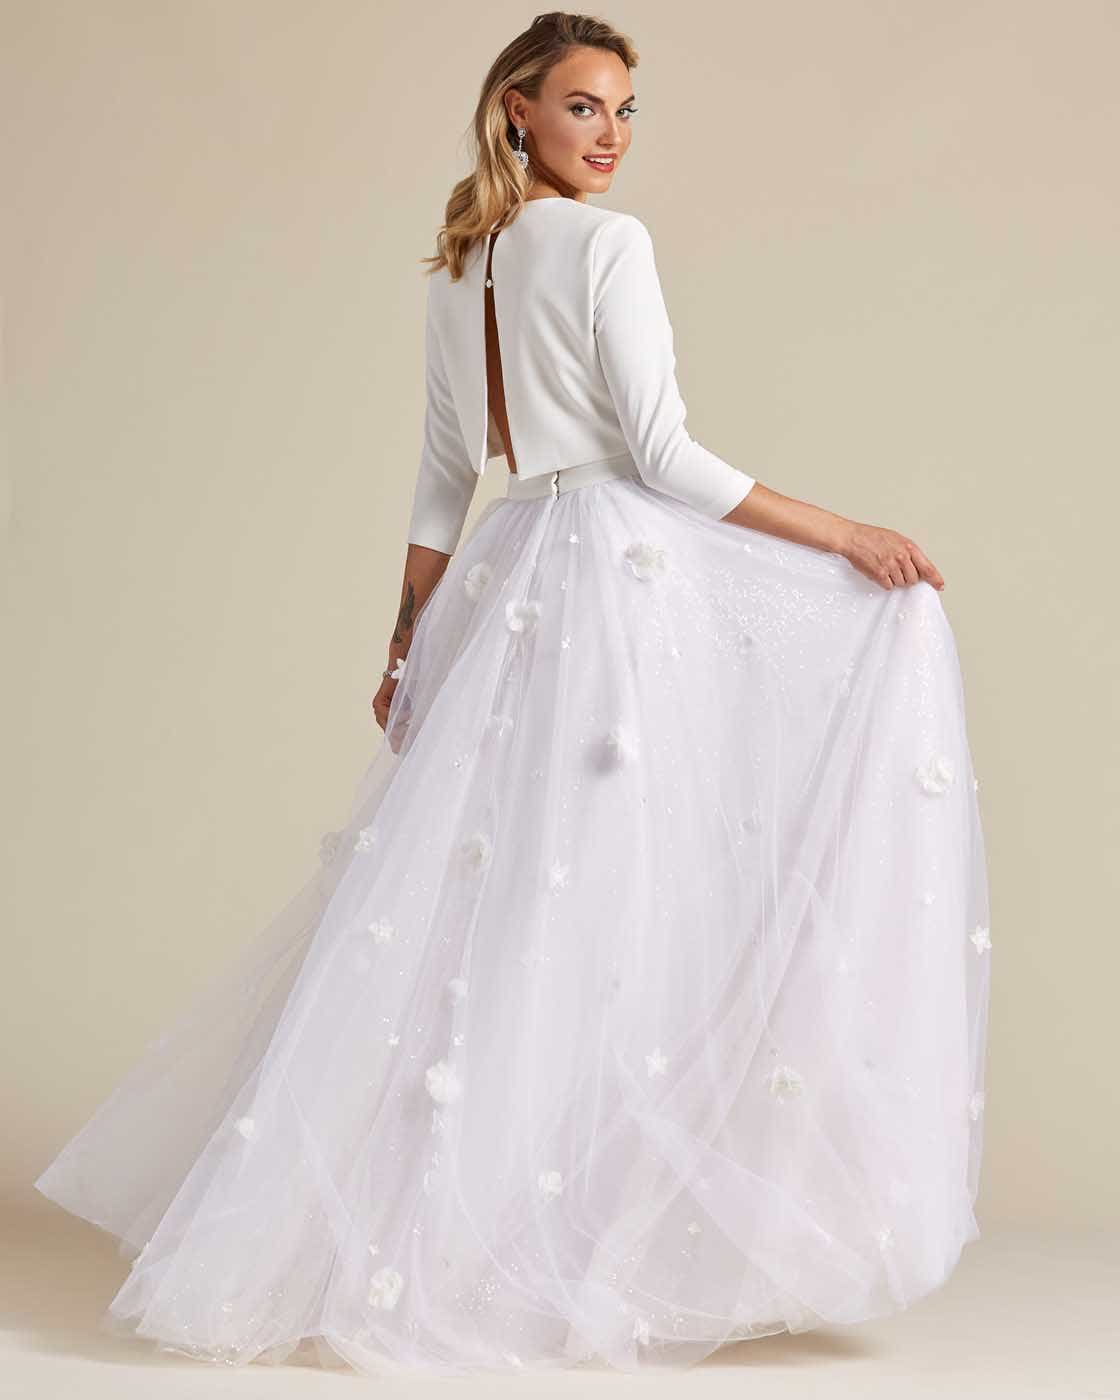 Minimal Style White Two Piece Wedding Dress - Detail Back